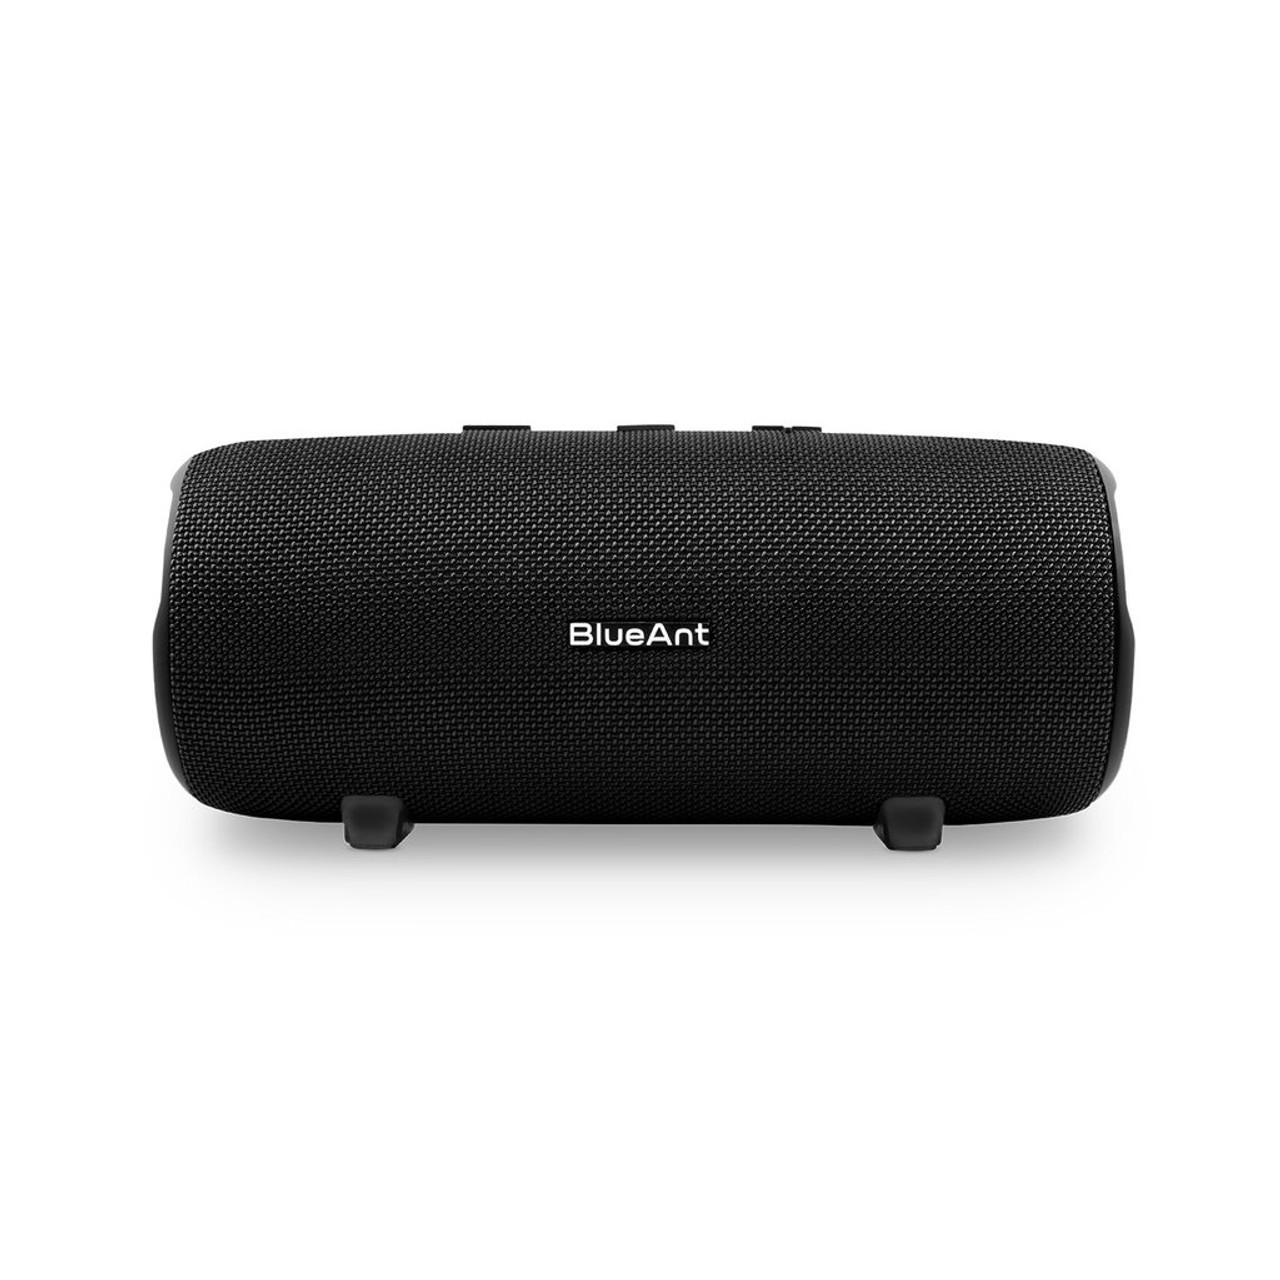 Blueant X3-BK 30W Water Resistant Portable Bluetooth Speaker - Black